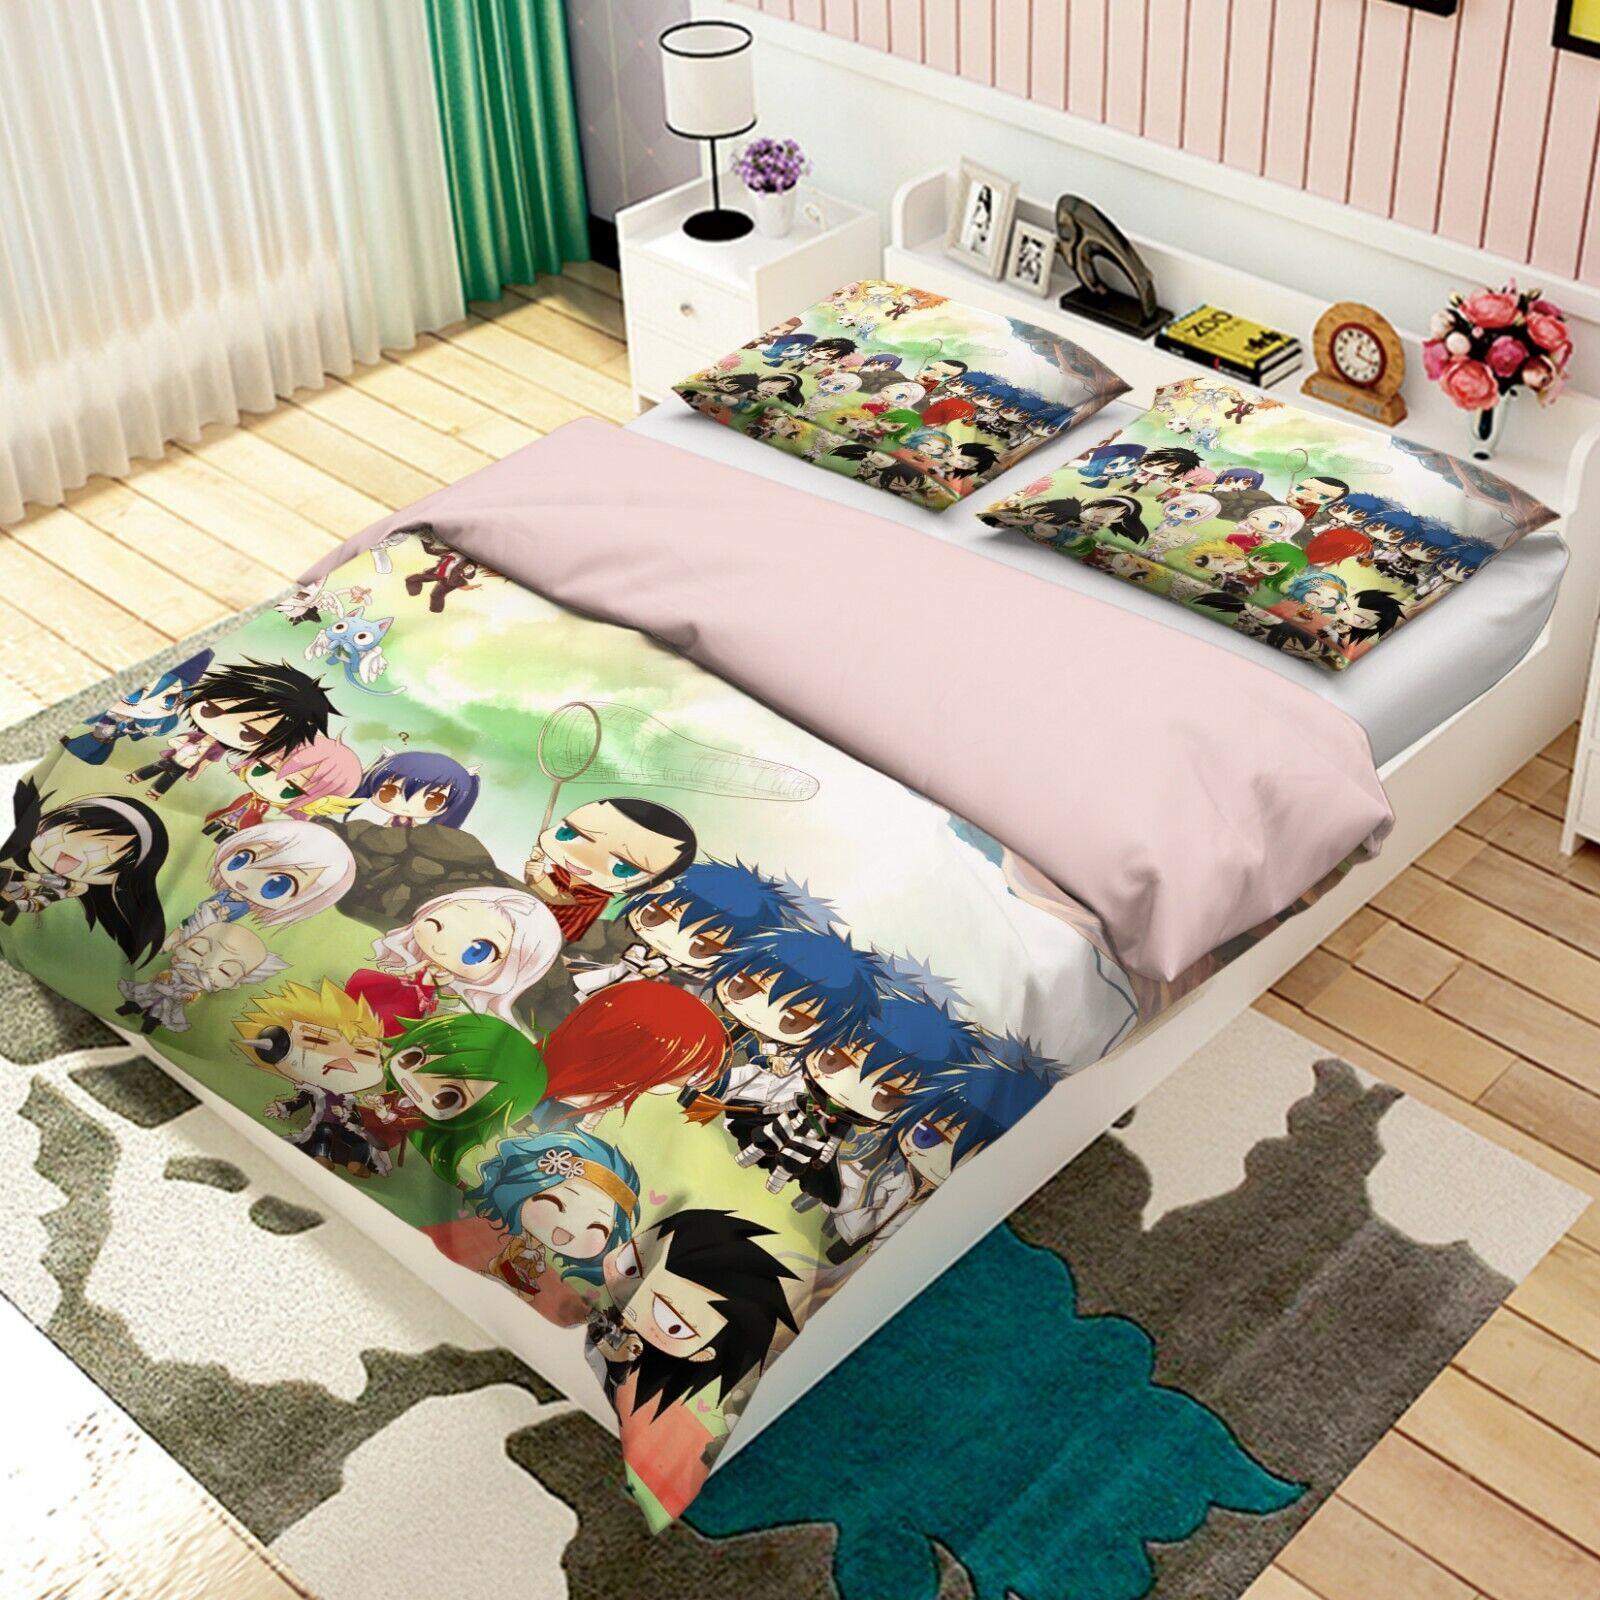 3D Fairy Tail Zeichen M399 Japan Anime Bett Kissenbezüge Bettbezug Angelia